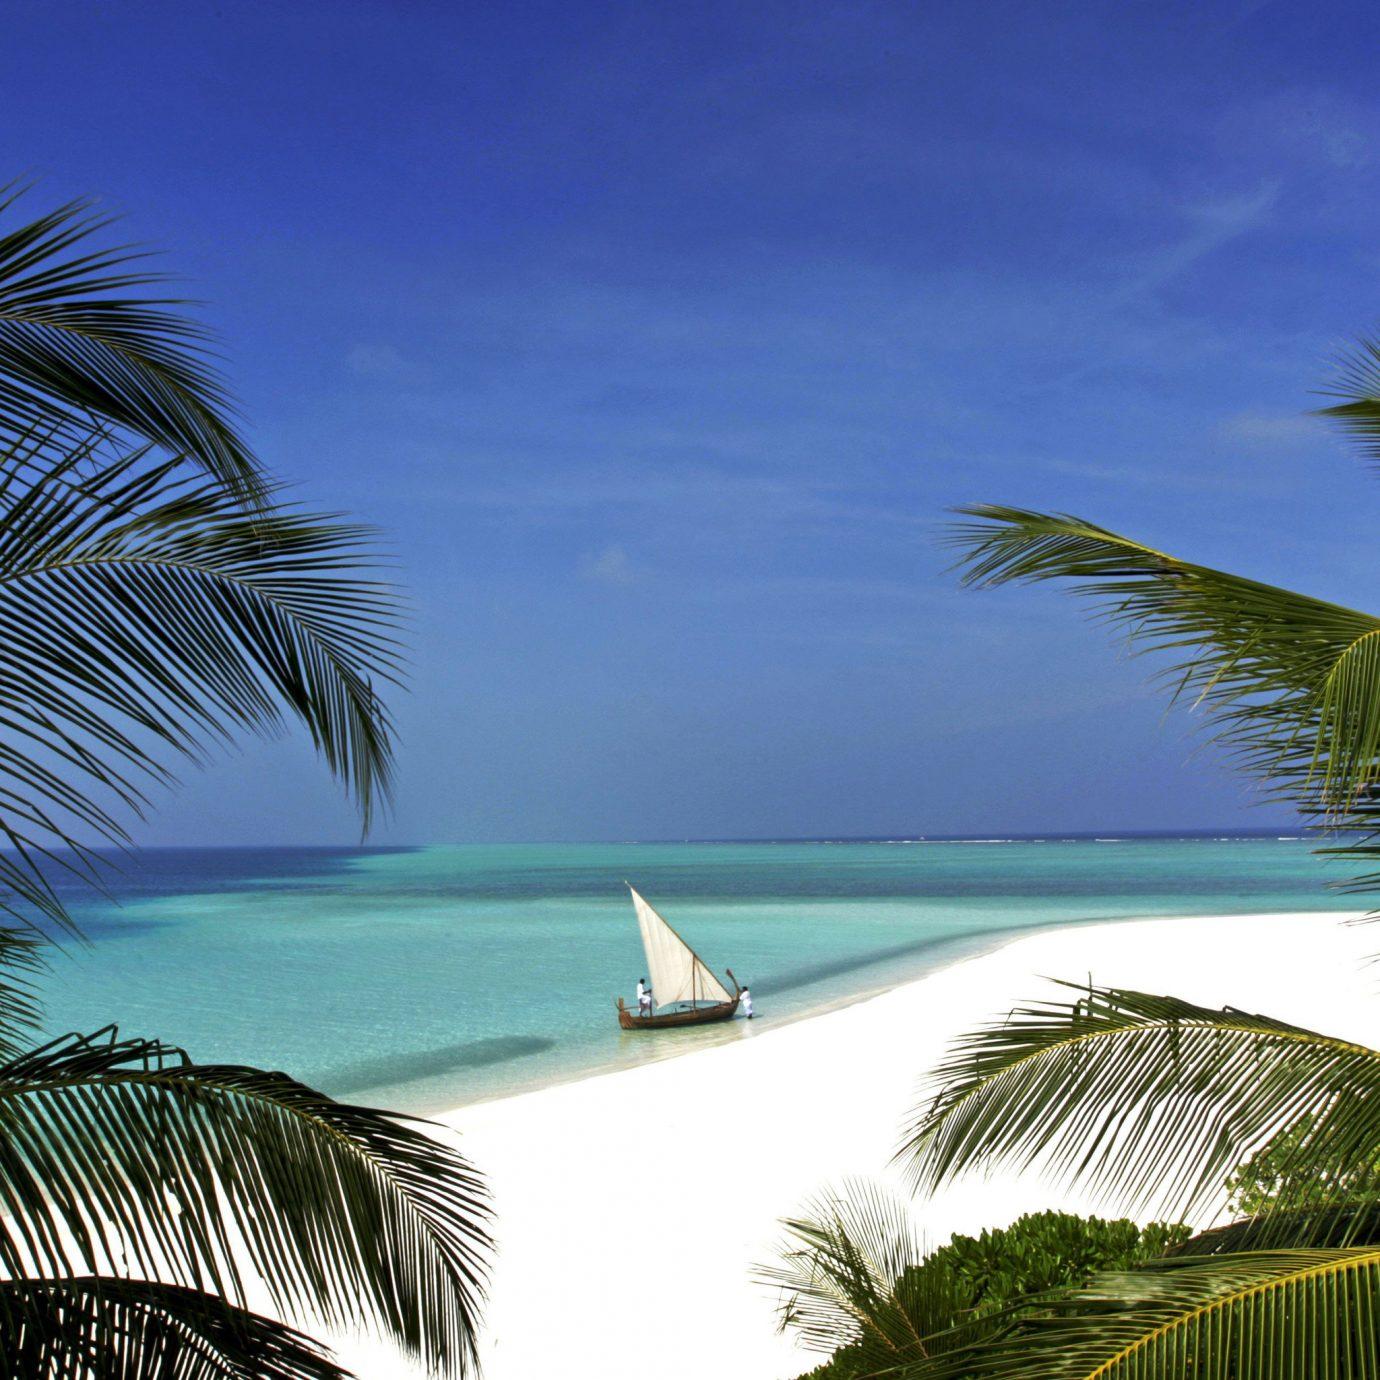 water tree sky plant palm Ocean caribbean palm family Beach tropics Sea arecales Coast swimming pool Resort Jungle overlooking Lagoon beautiful shore sandy